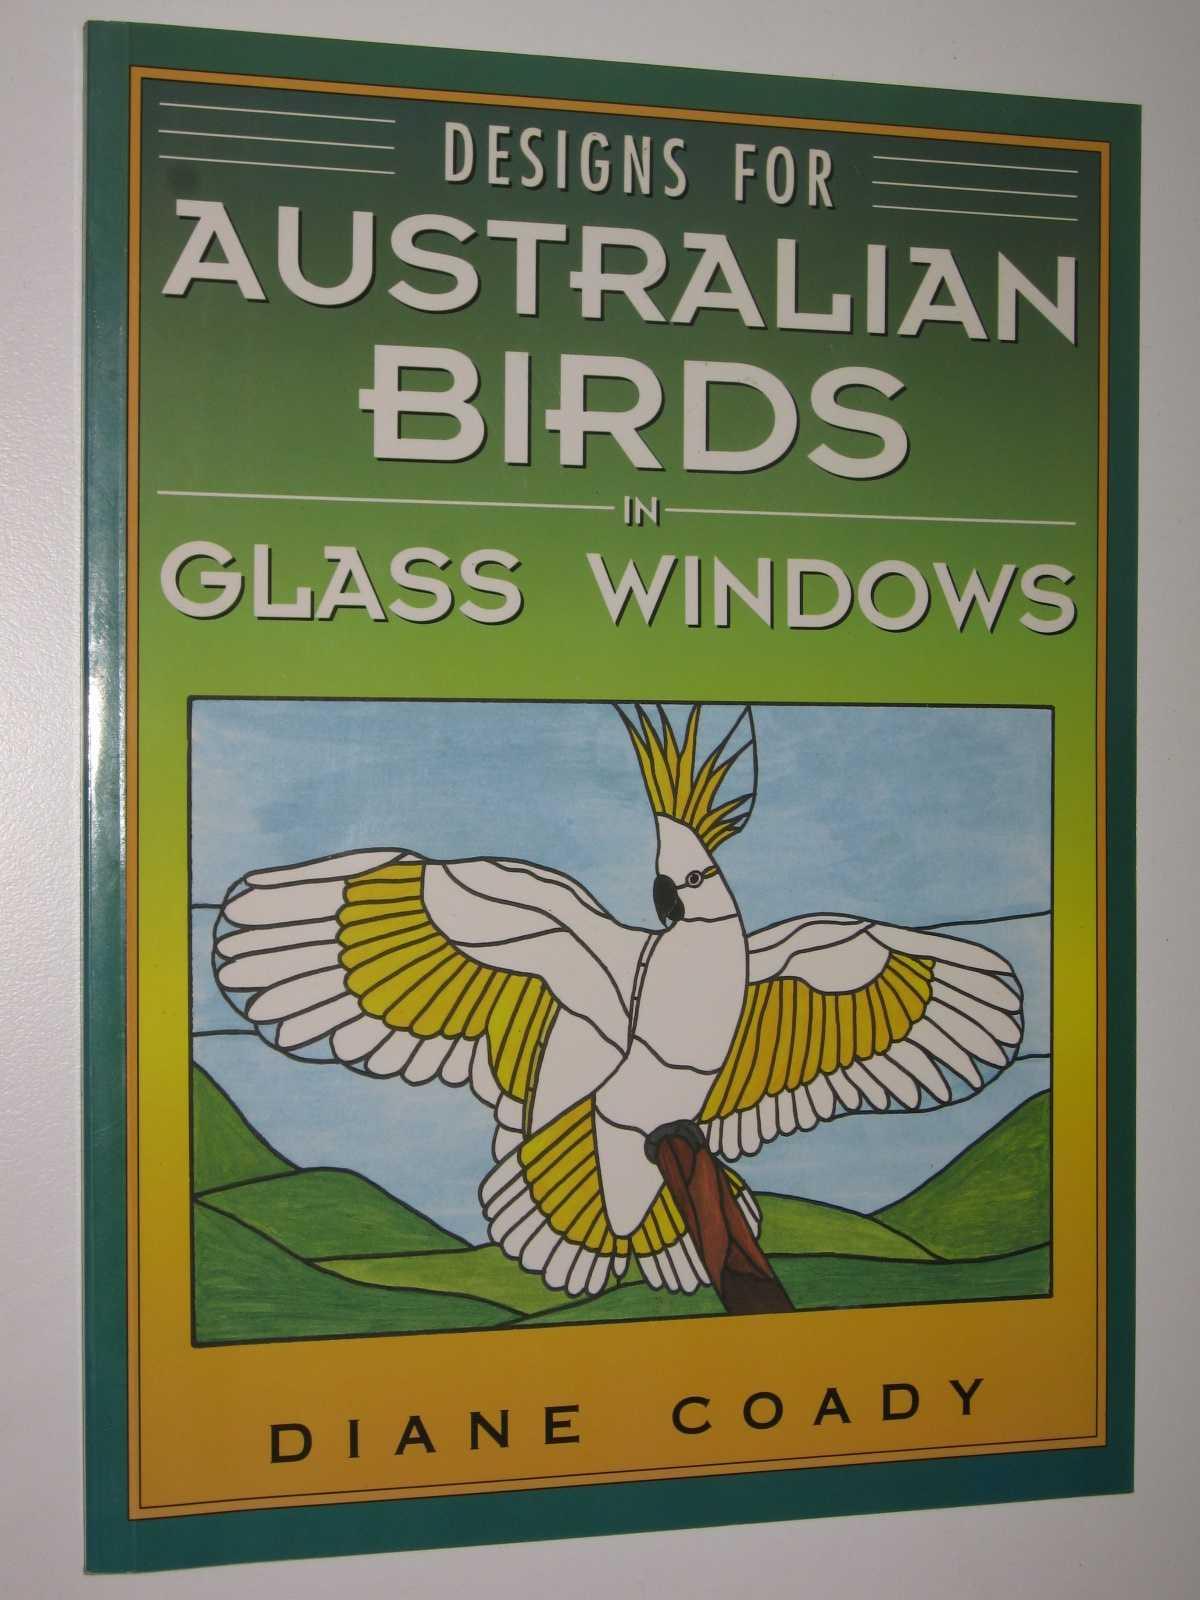 Designs for Australian Birds in Glass Windows, Coady, Diane